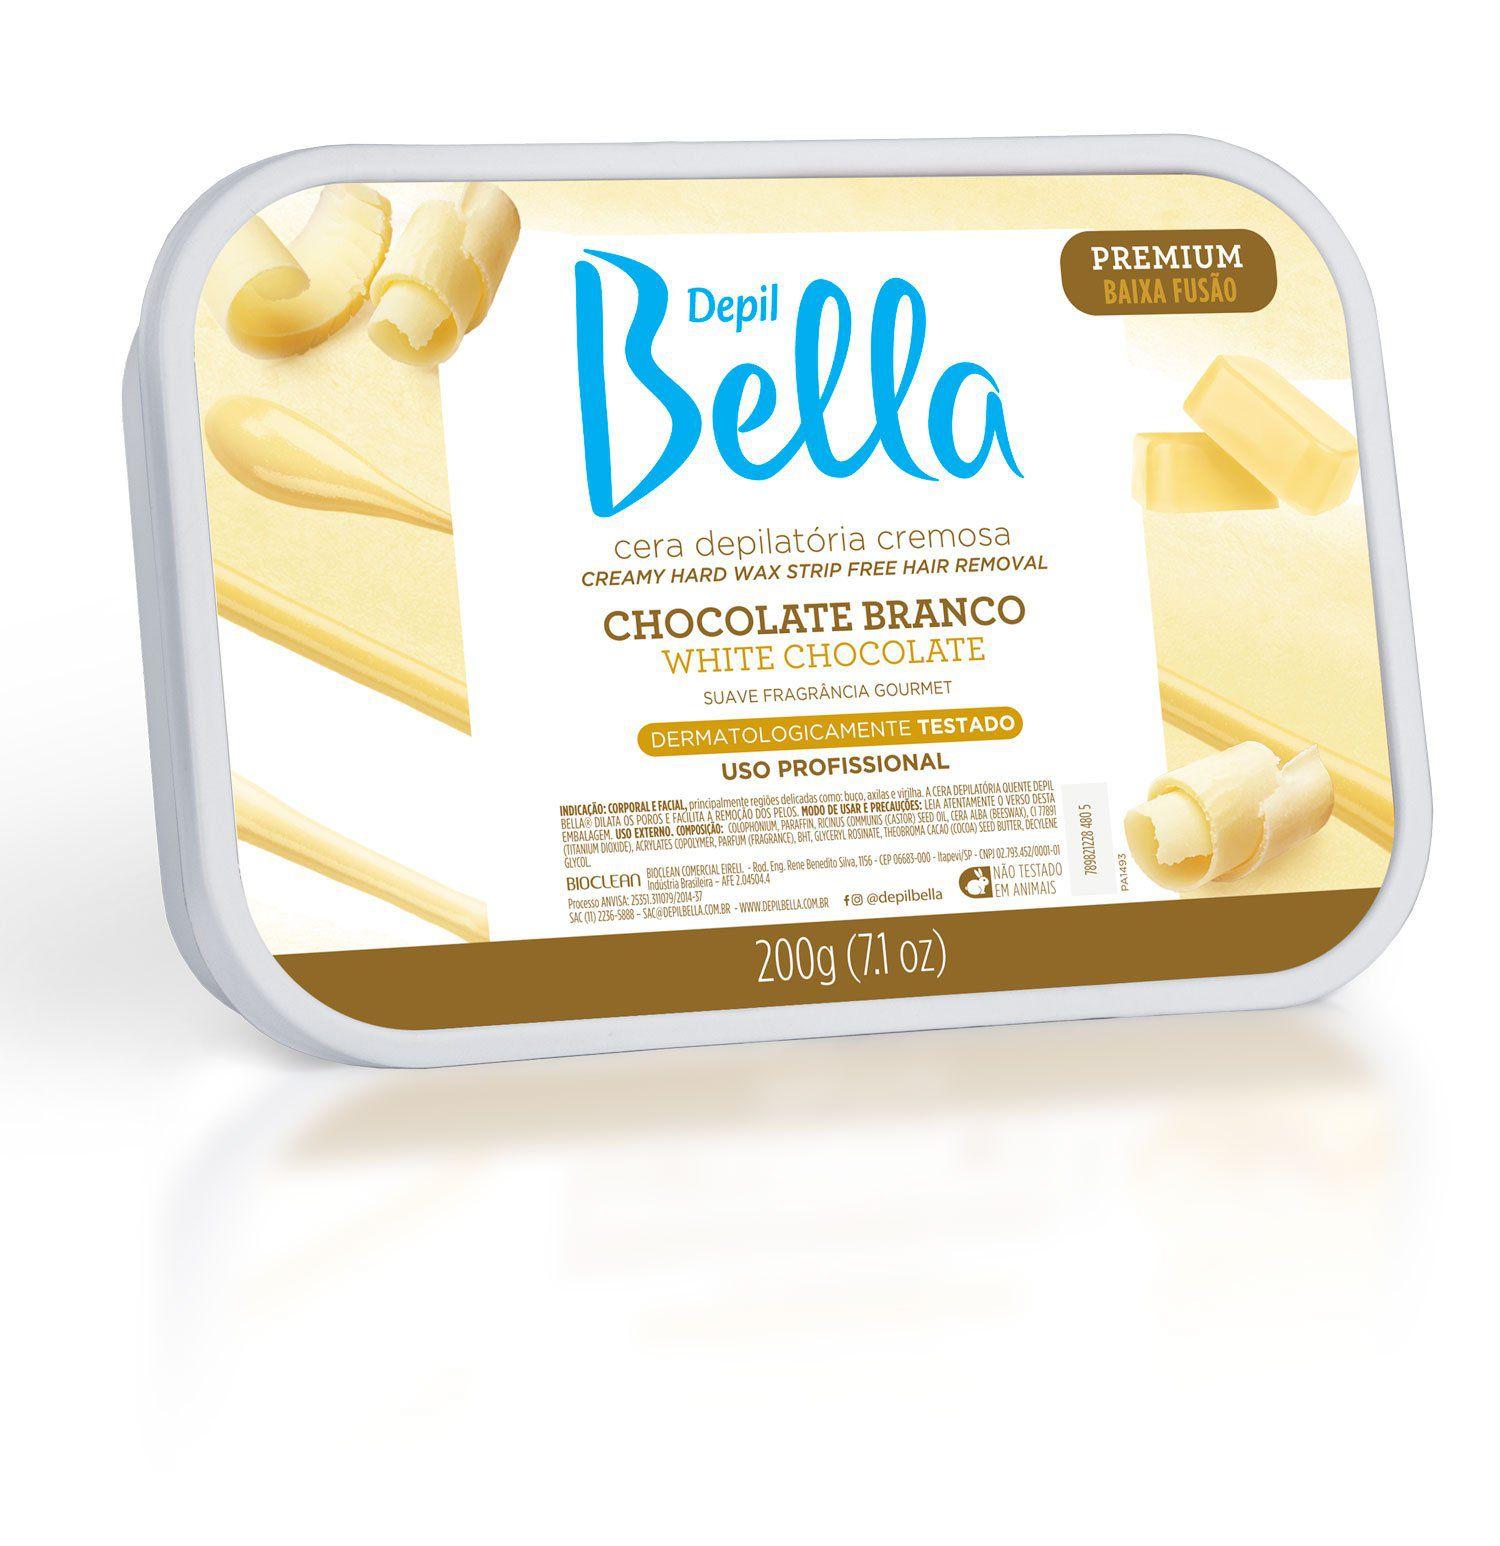 Cera Quente em Barra Cremosa Elástica Chocolate Branco Premium Depil Bella 200 g